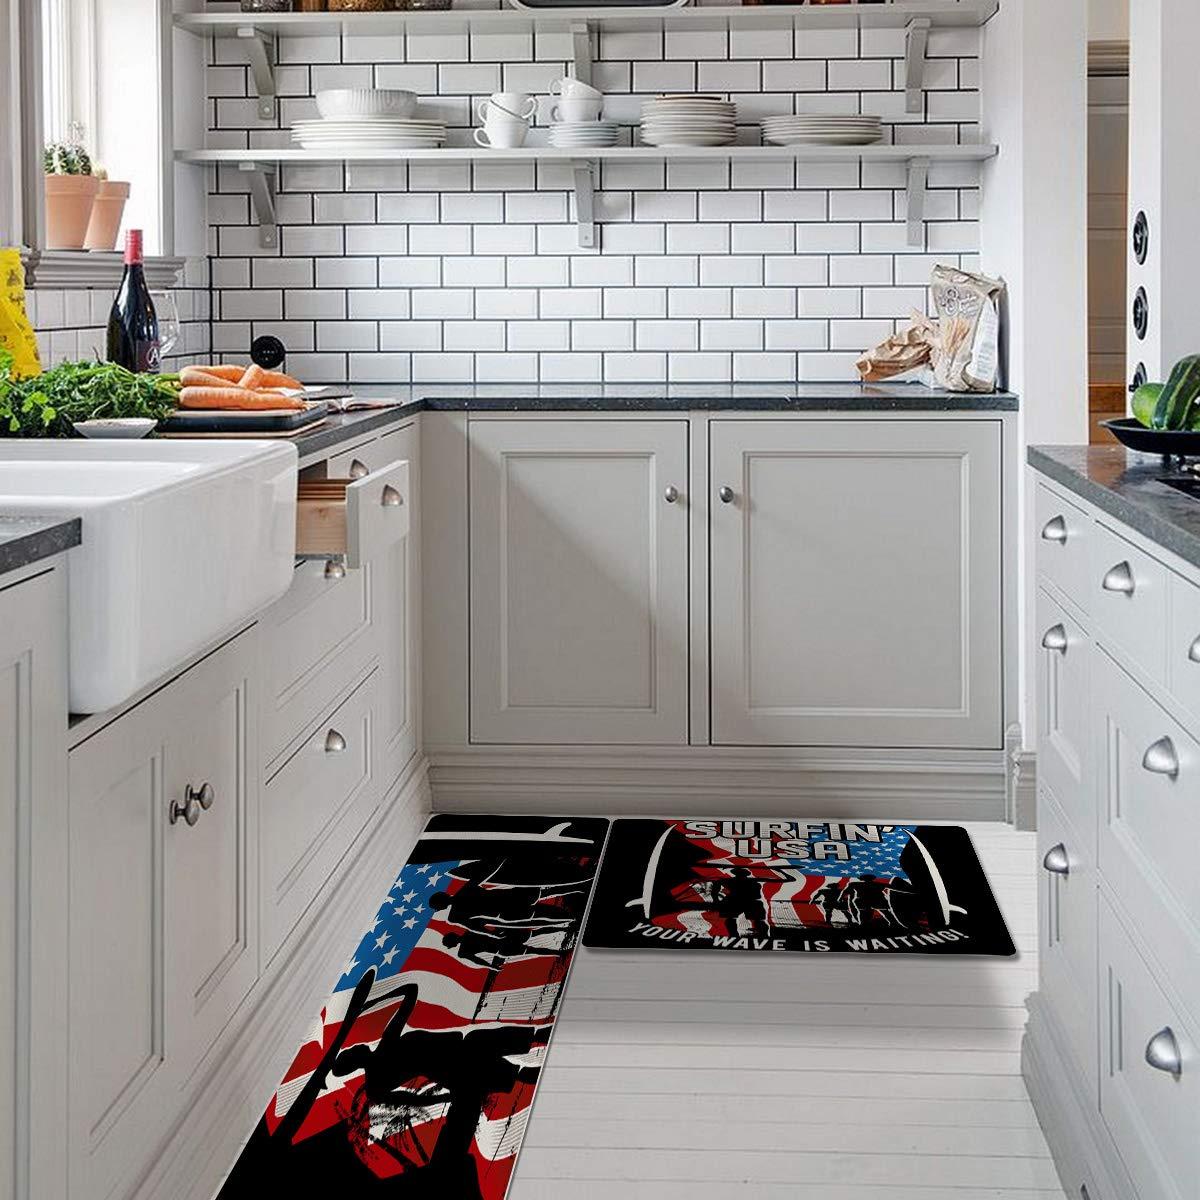 9 Piece Non Slip Rugs Waterproof Kitchen Rugs Fruit Pattern Runner ...